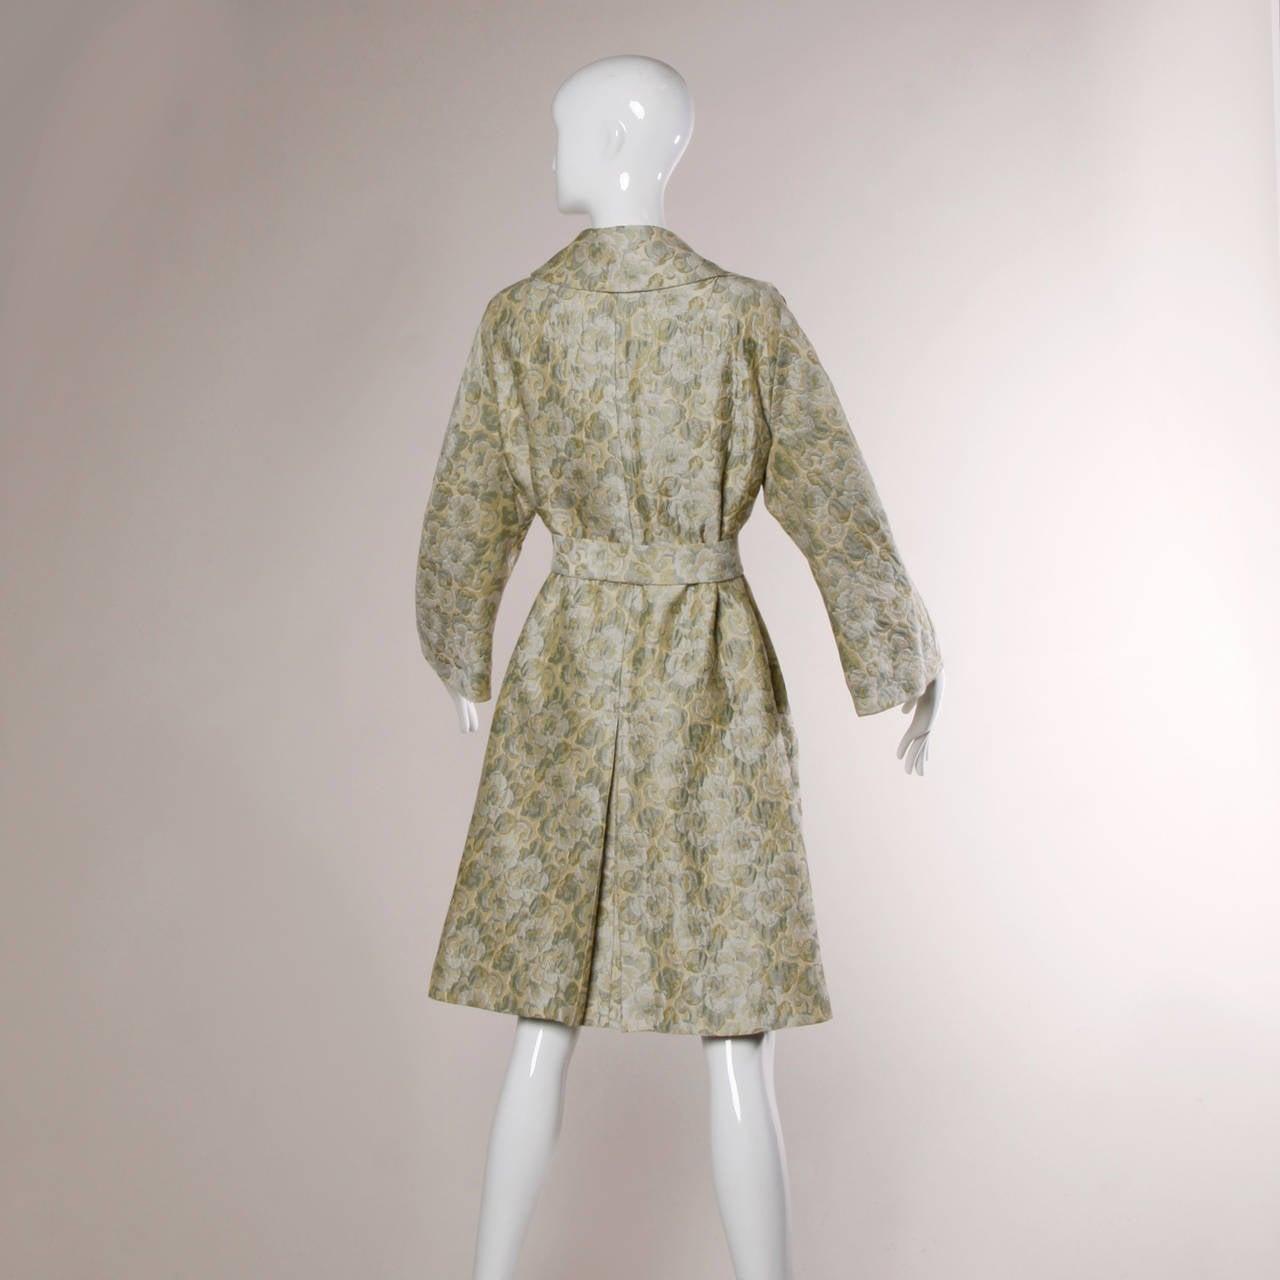 Joseph Magnin 1960s Vintage Metallic Brocade Tapestry Trench Coat 4